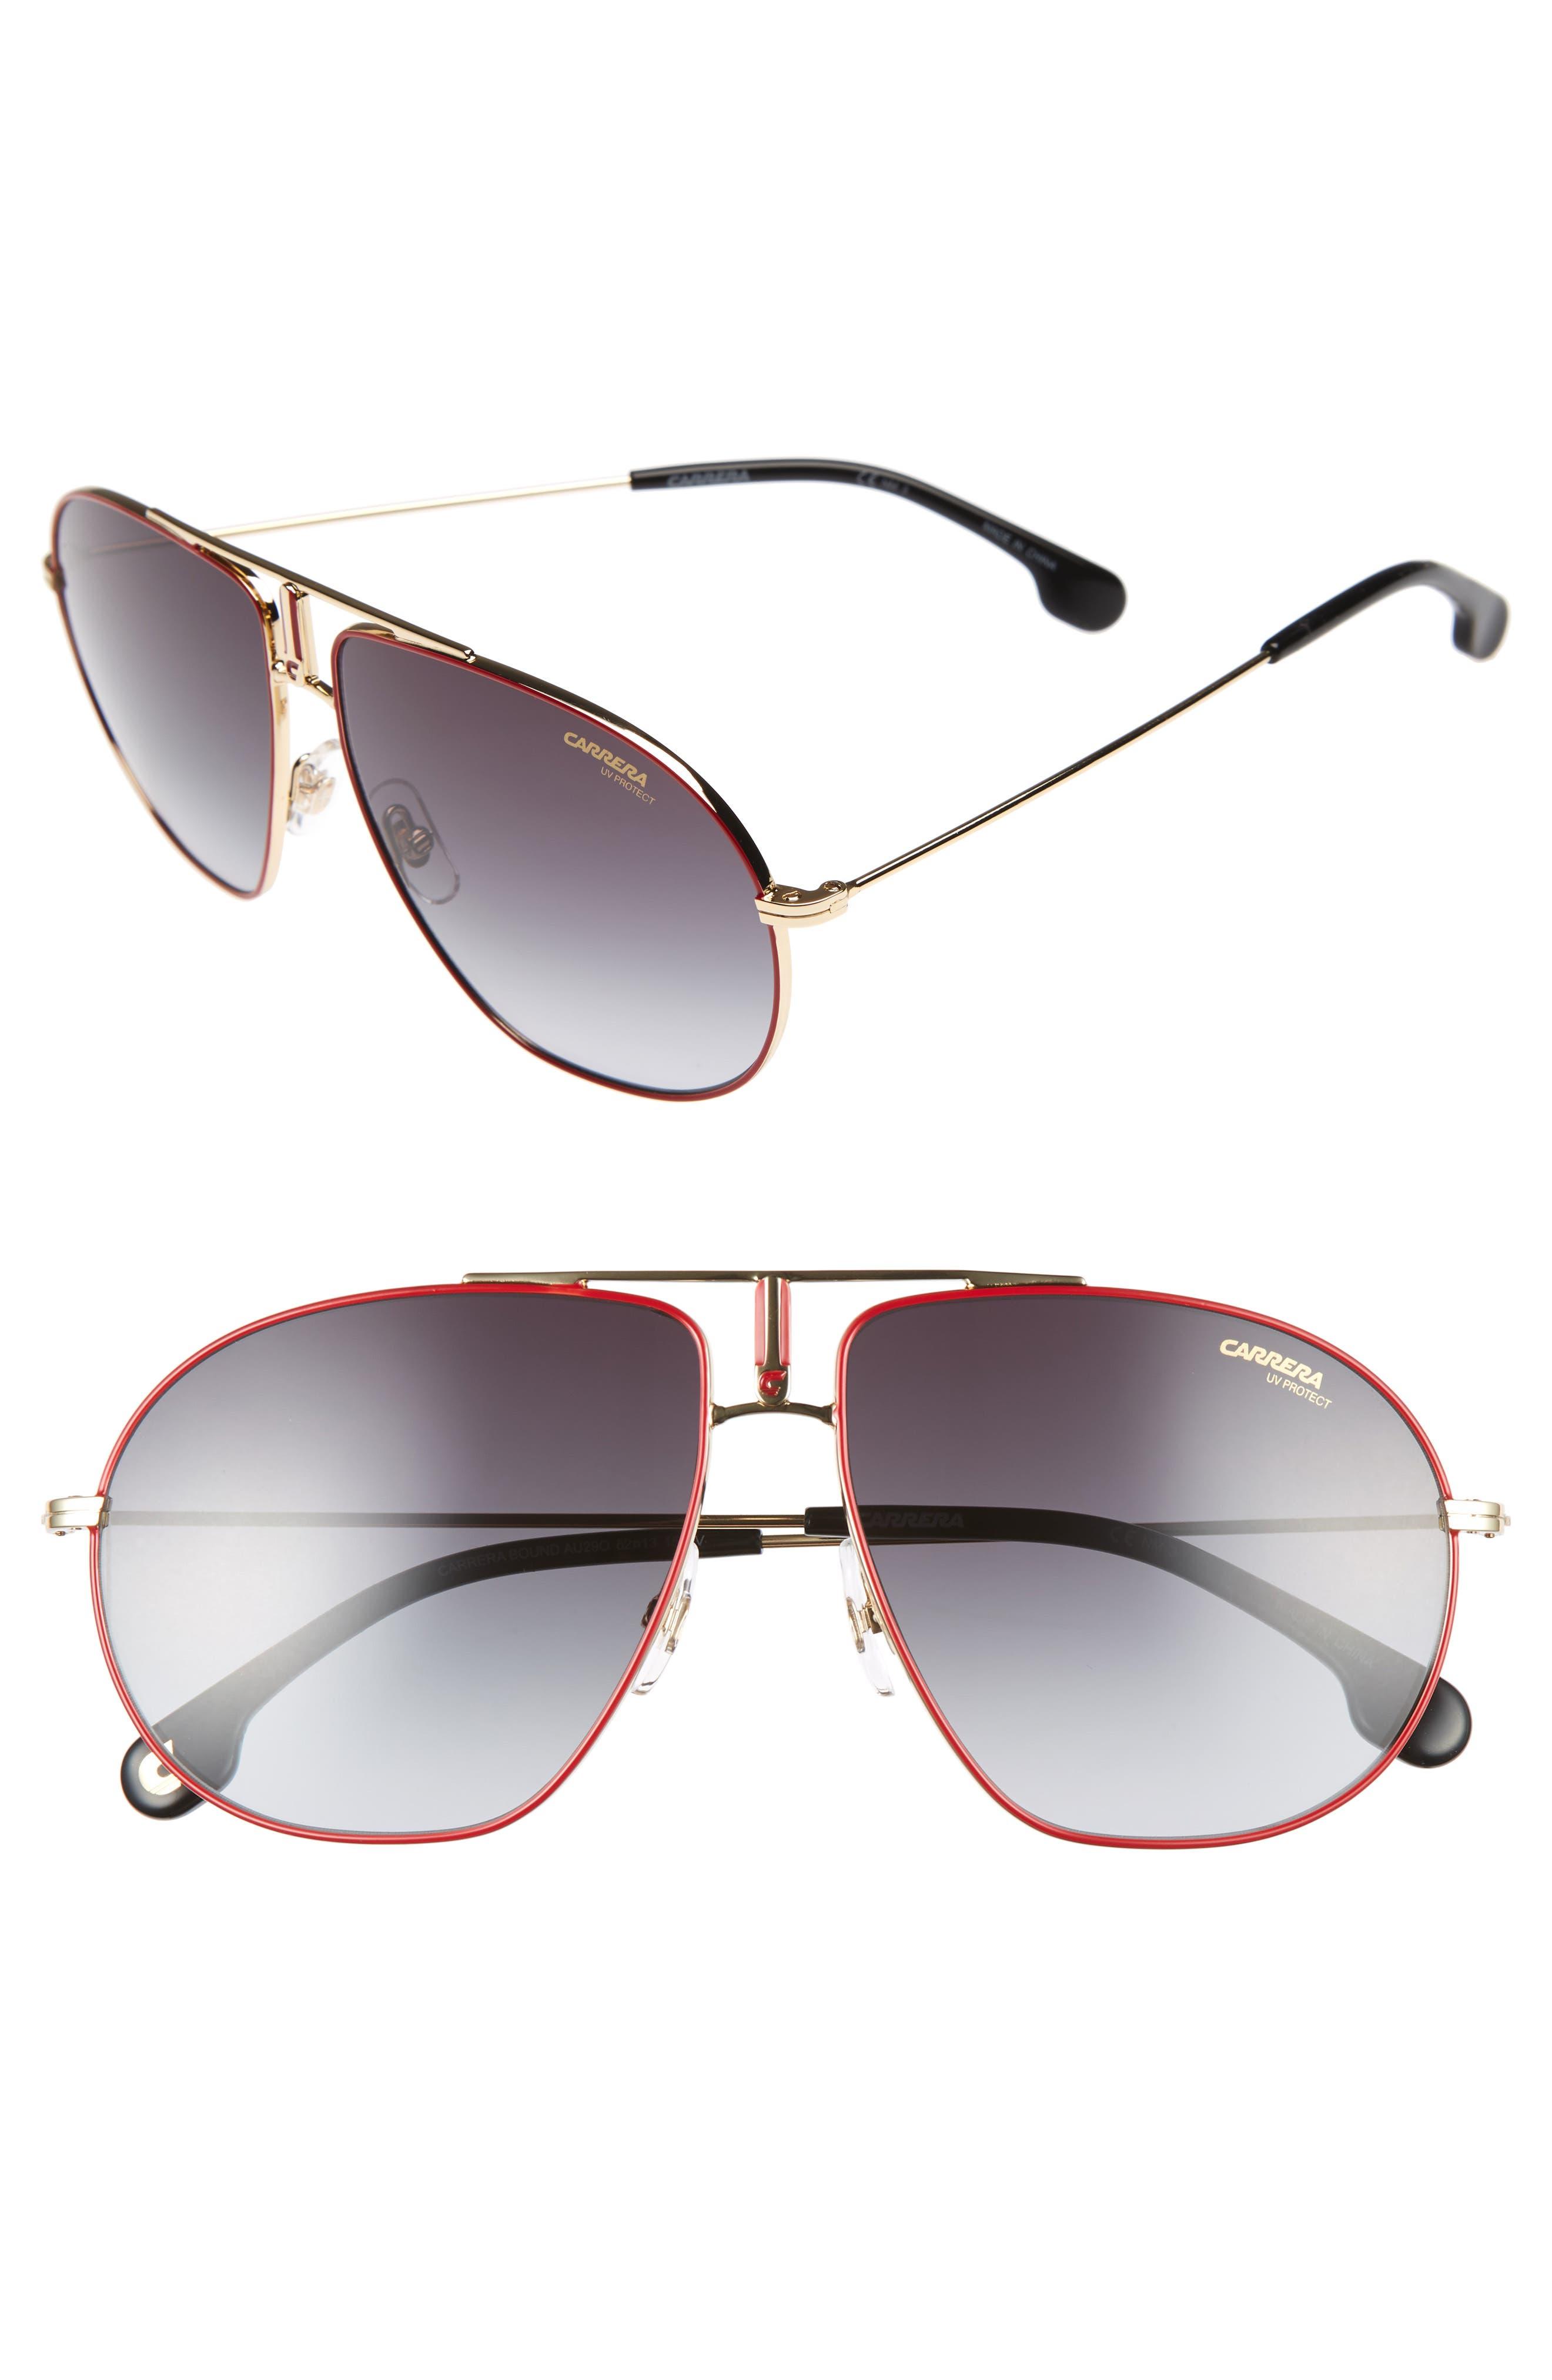 Carrera Eyewear Bounds 60Mm Gradient Aviator Sunglasses -